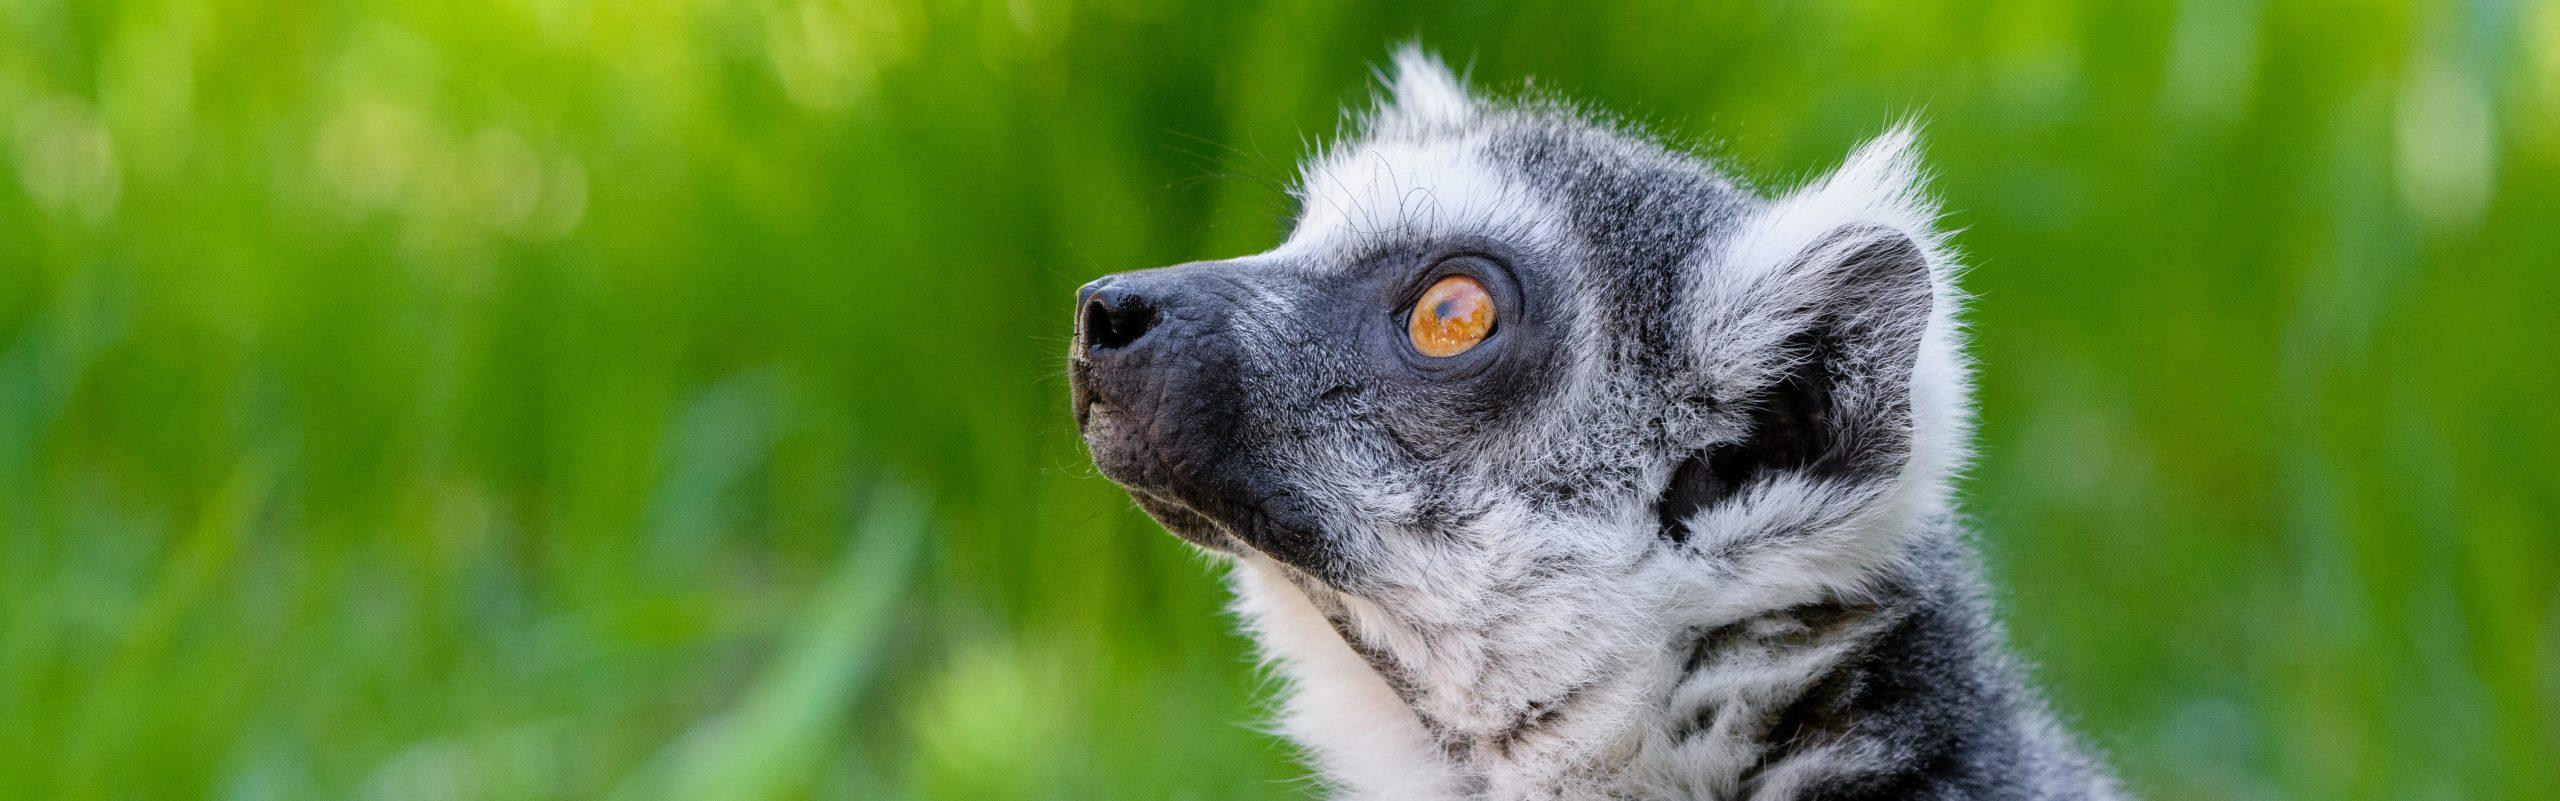 https://faunafocus.com/home/november-2018-ring-tailed-lemur/#jp-carousel-11923